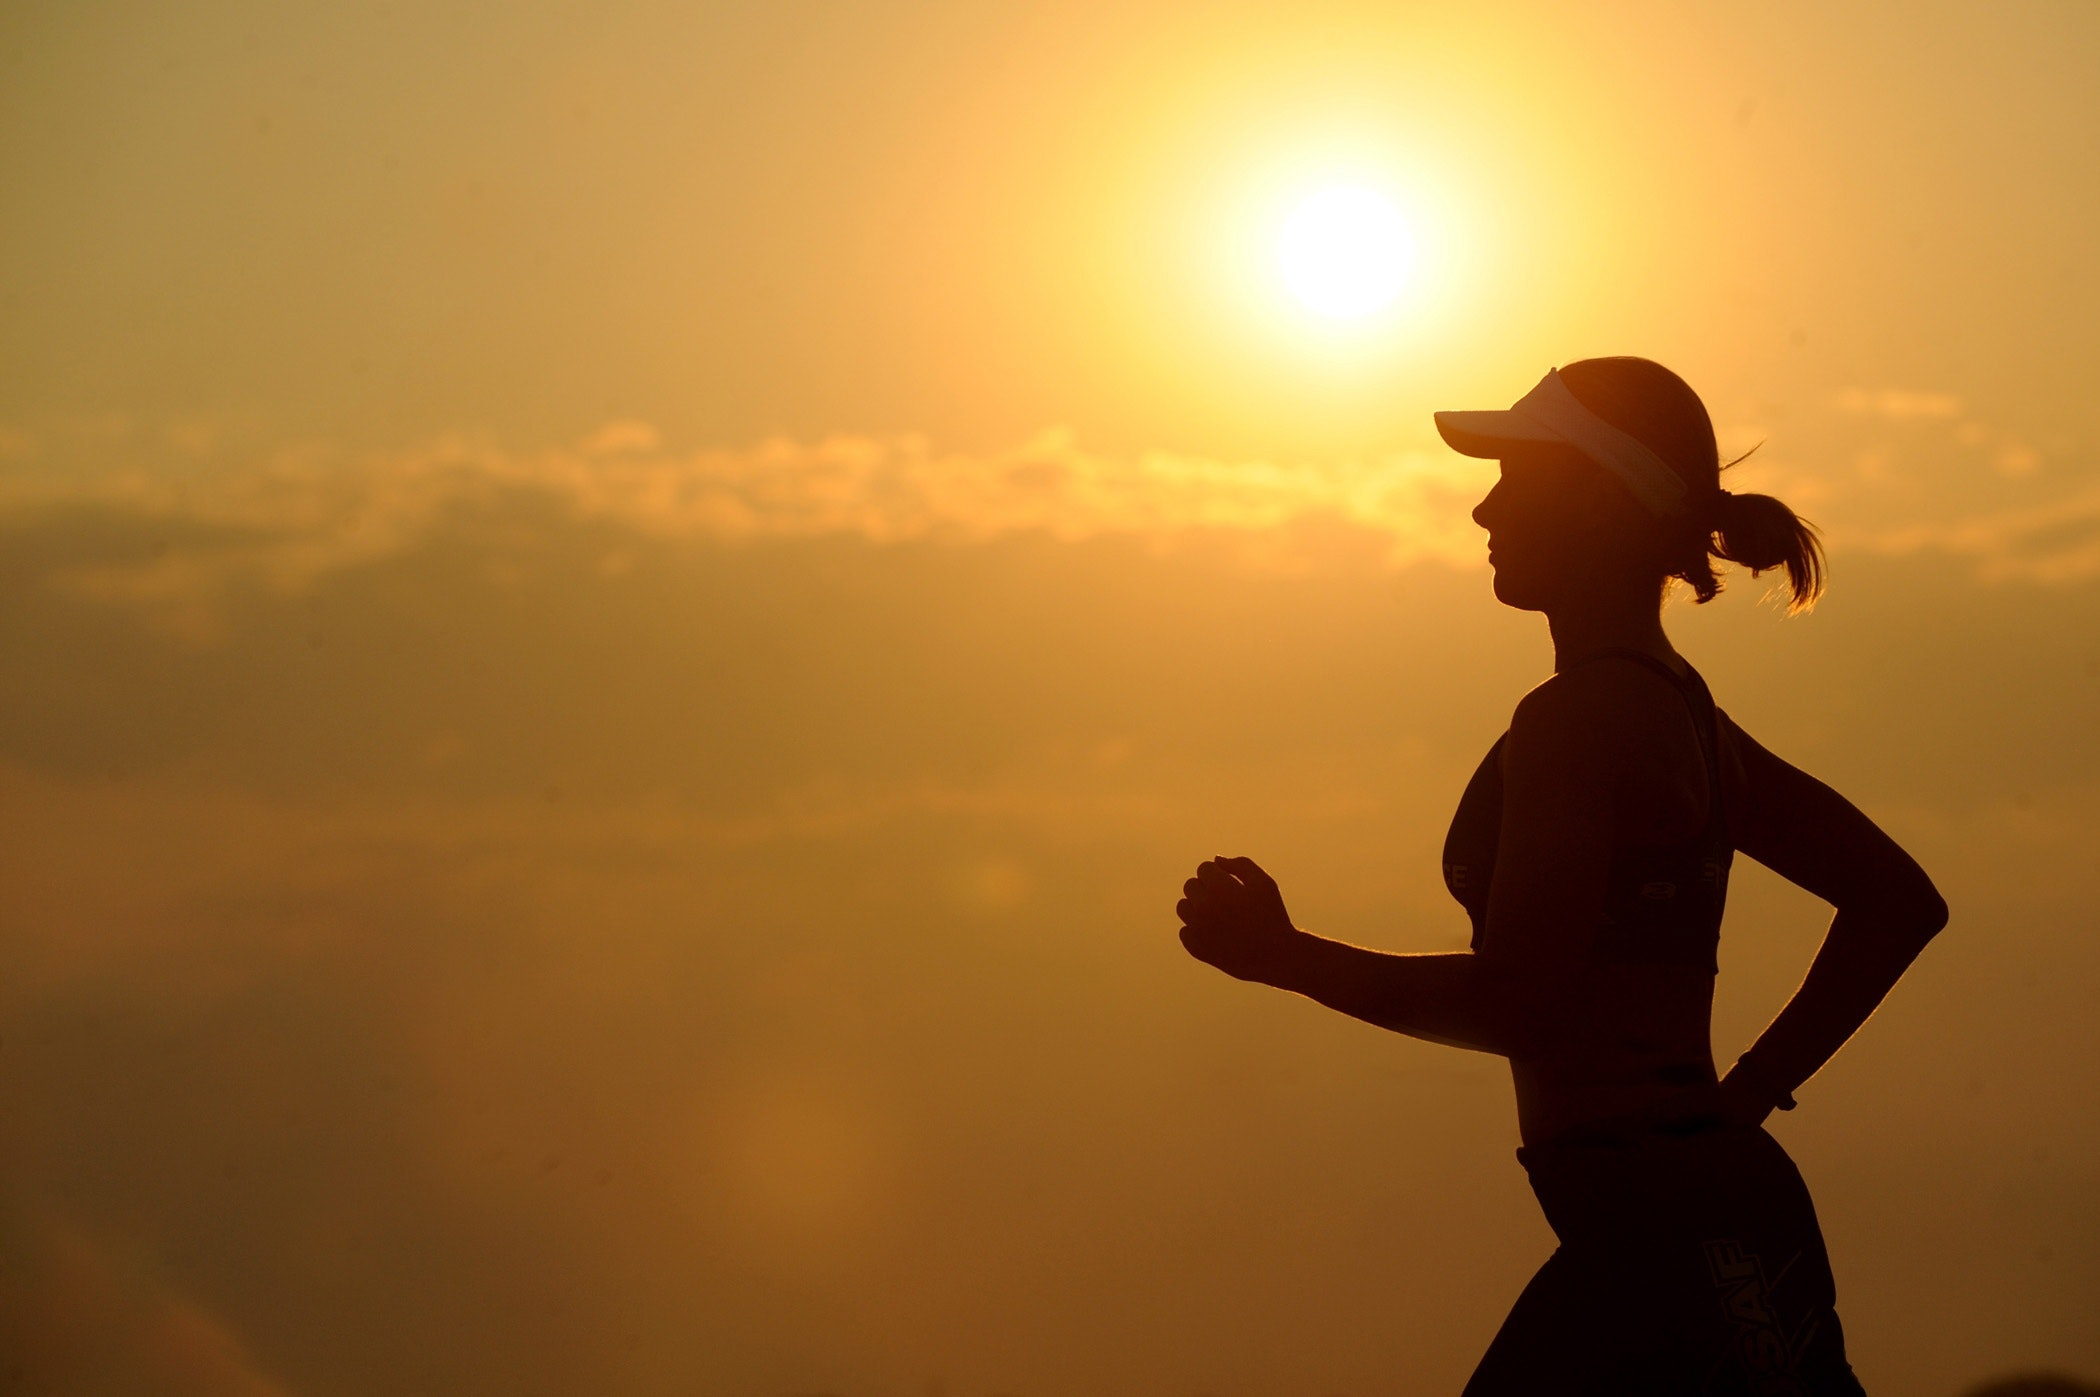 Woman With White Sunvisor Running, Endurance, Runner, Training, Sunset, HQ Photo